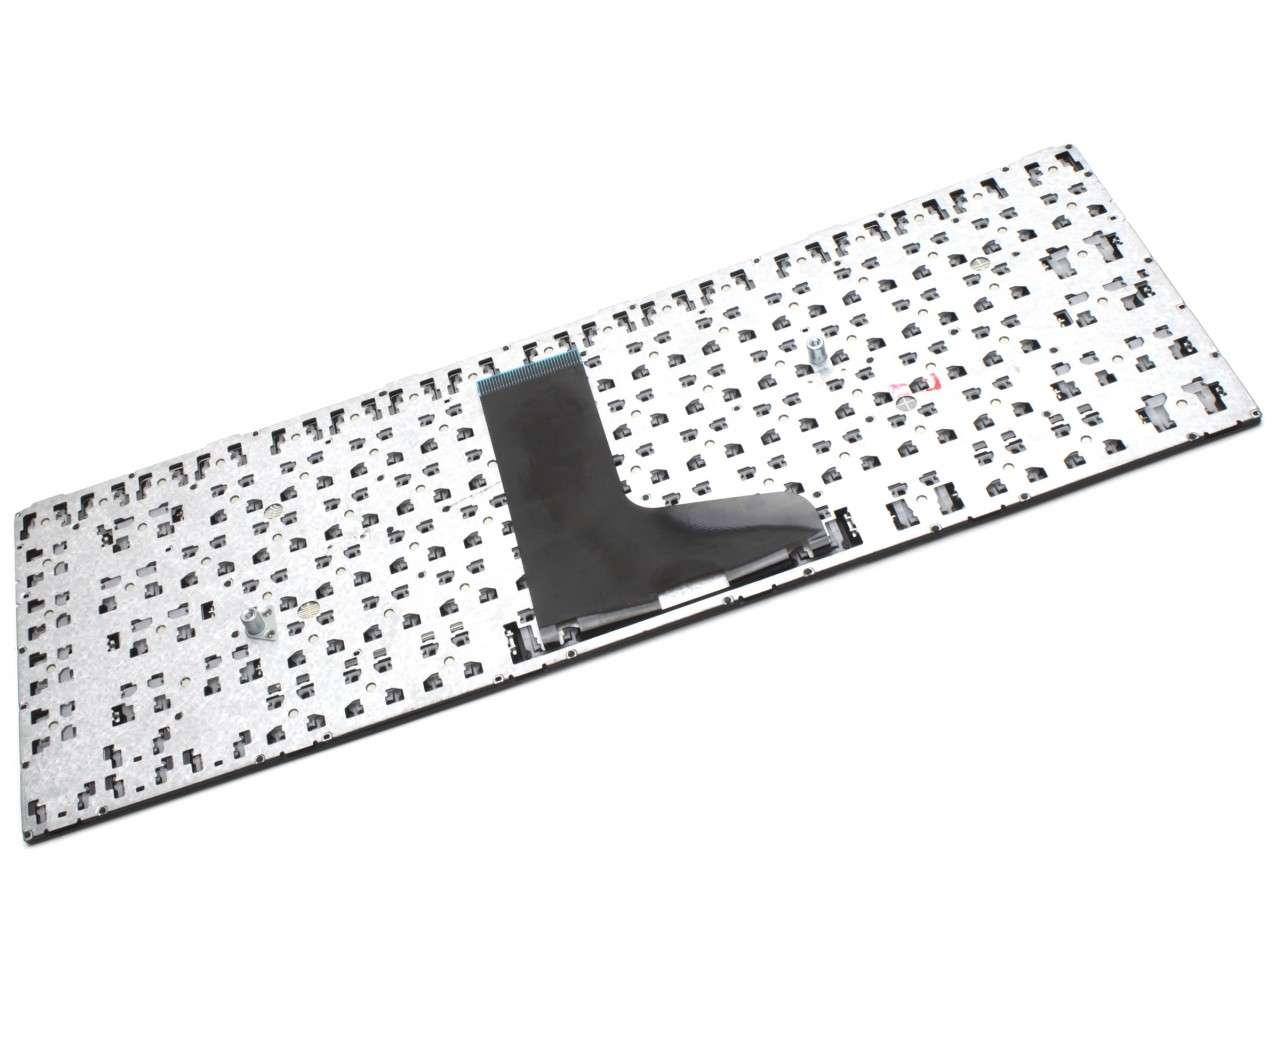 Tastatura Toshiba Satellite L40D A imagine powerlaptop.ro 2021